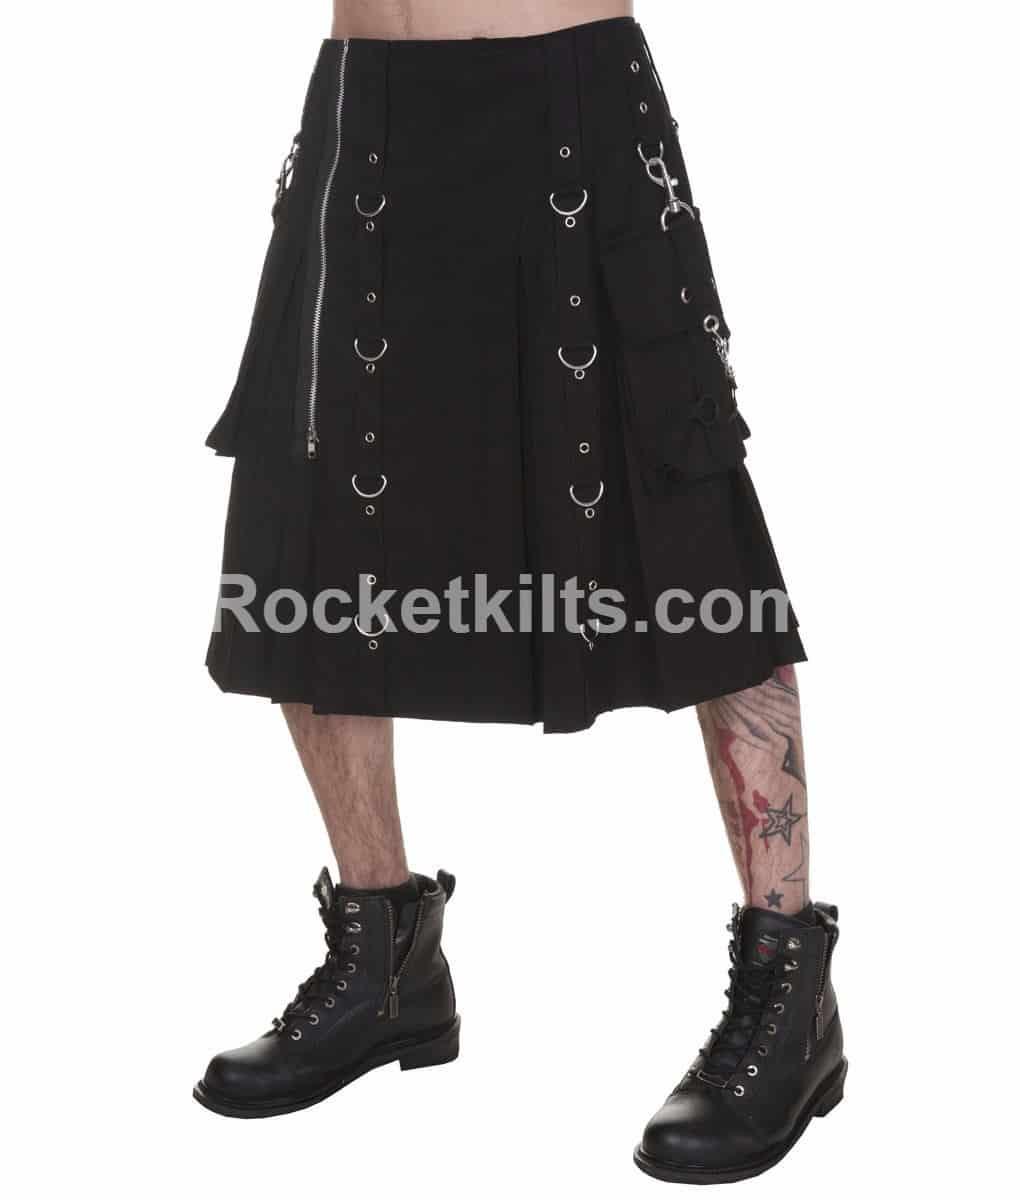 Steampunk Kilts